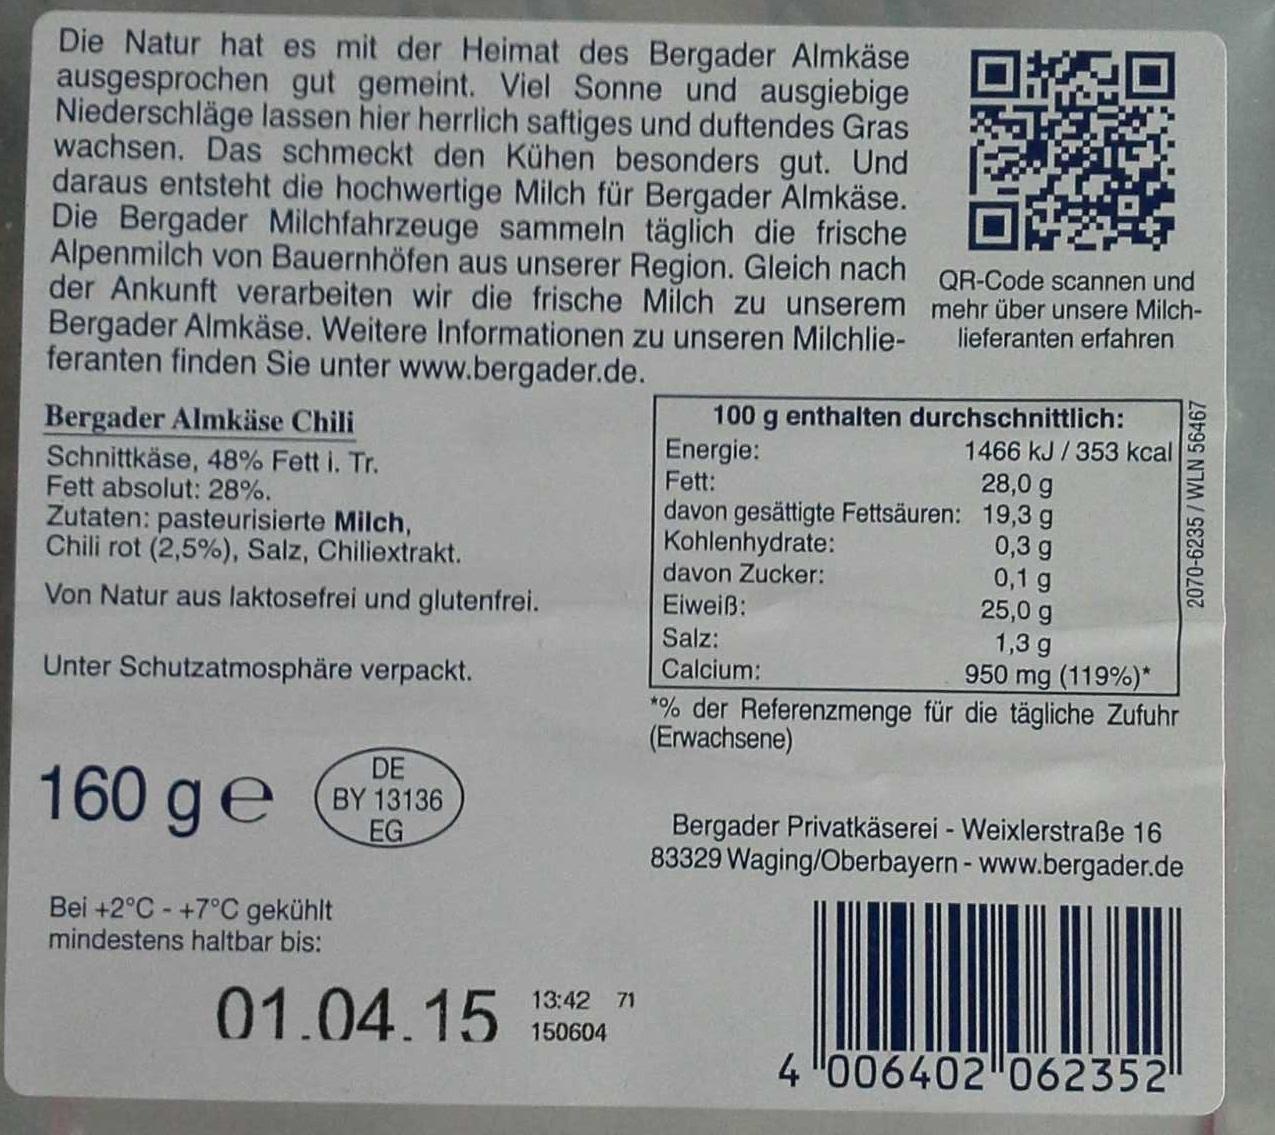 Bergader Almkäse Chili - Ingredients - de